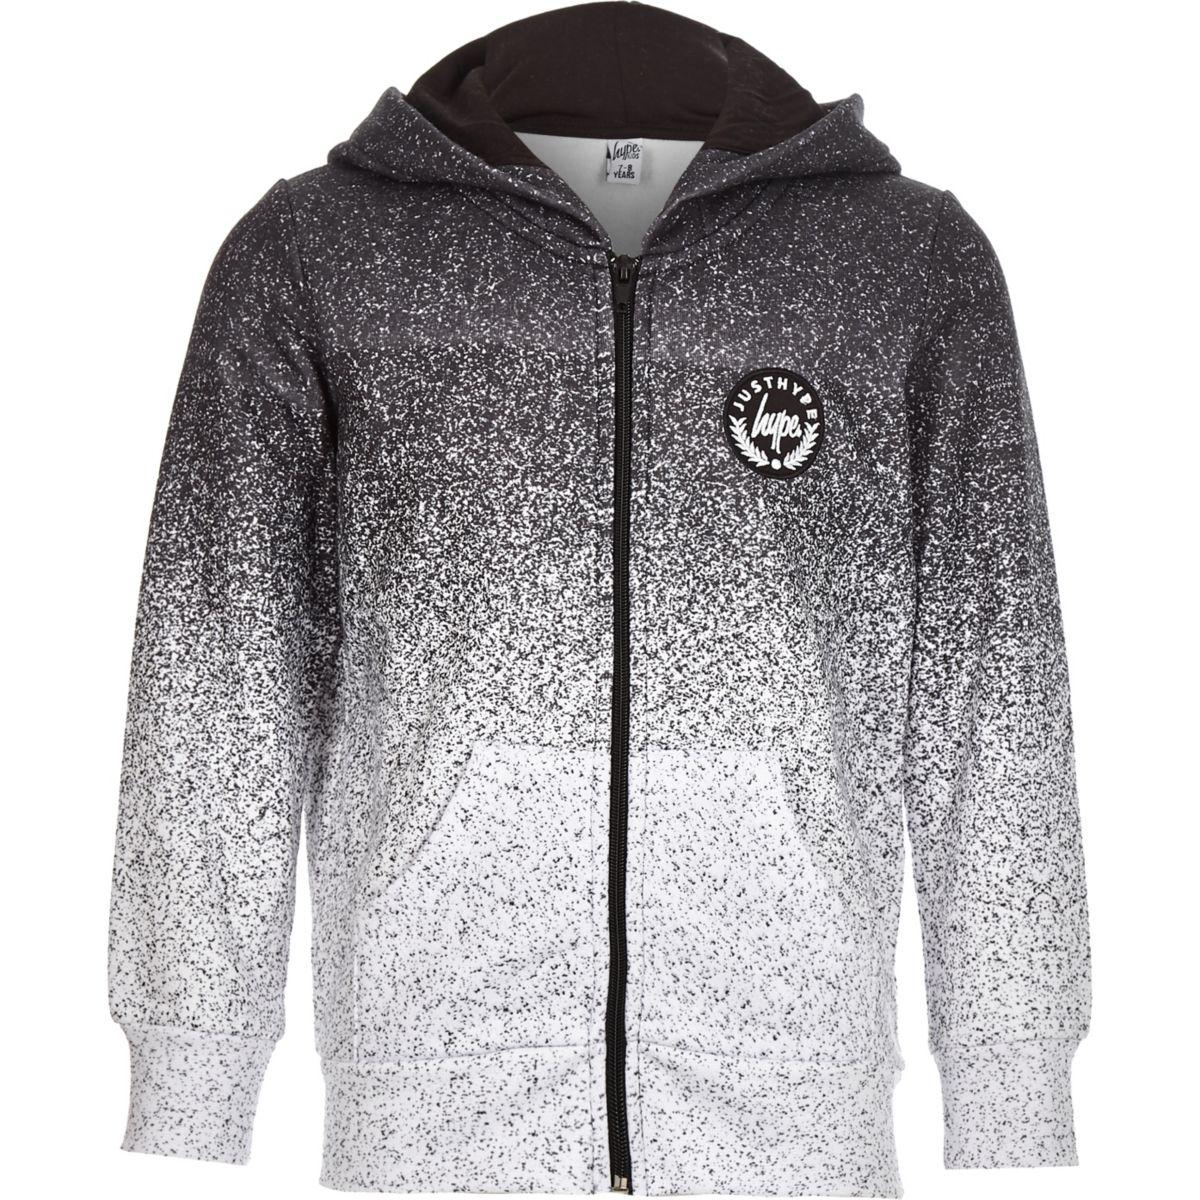 Boys Hype grey speckled zip front hoodie